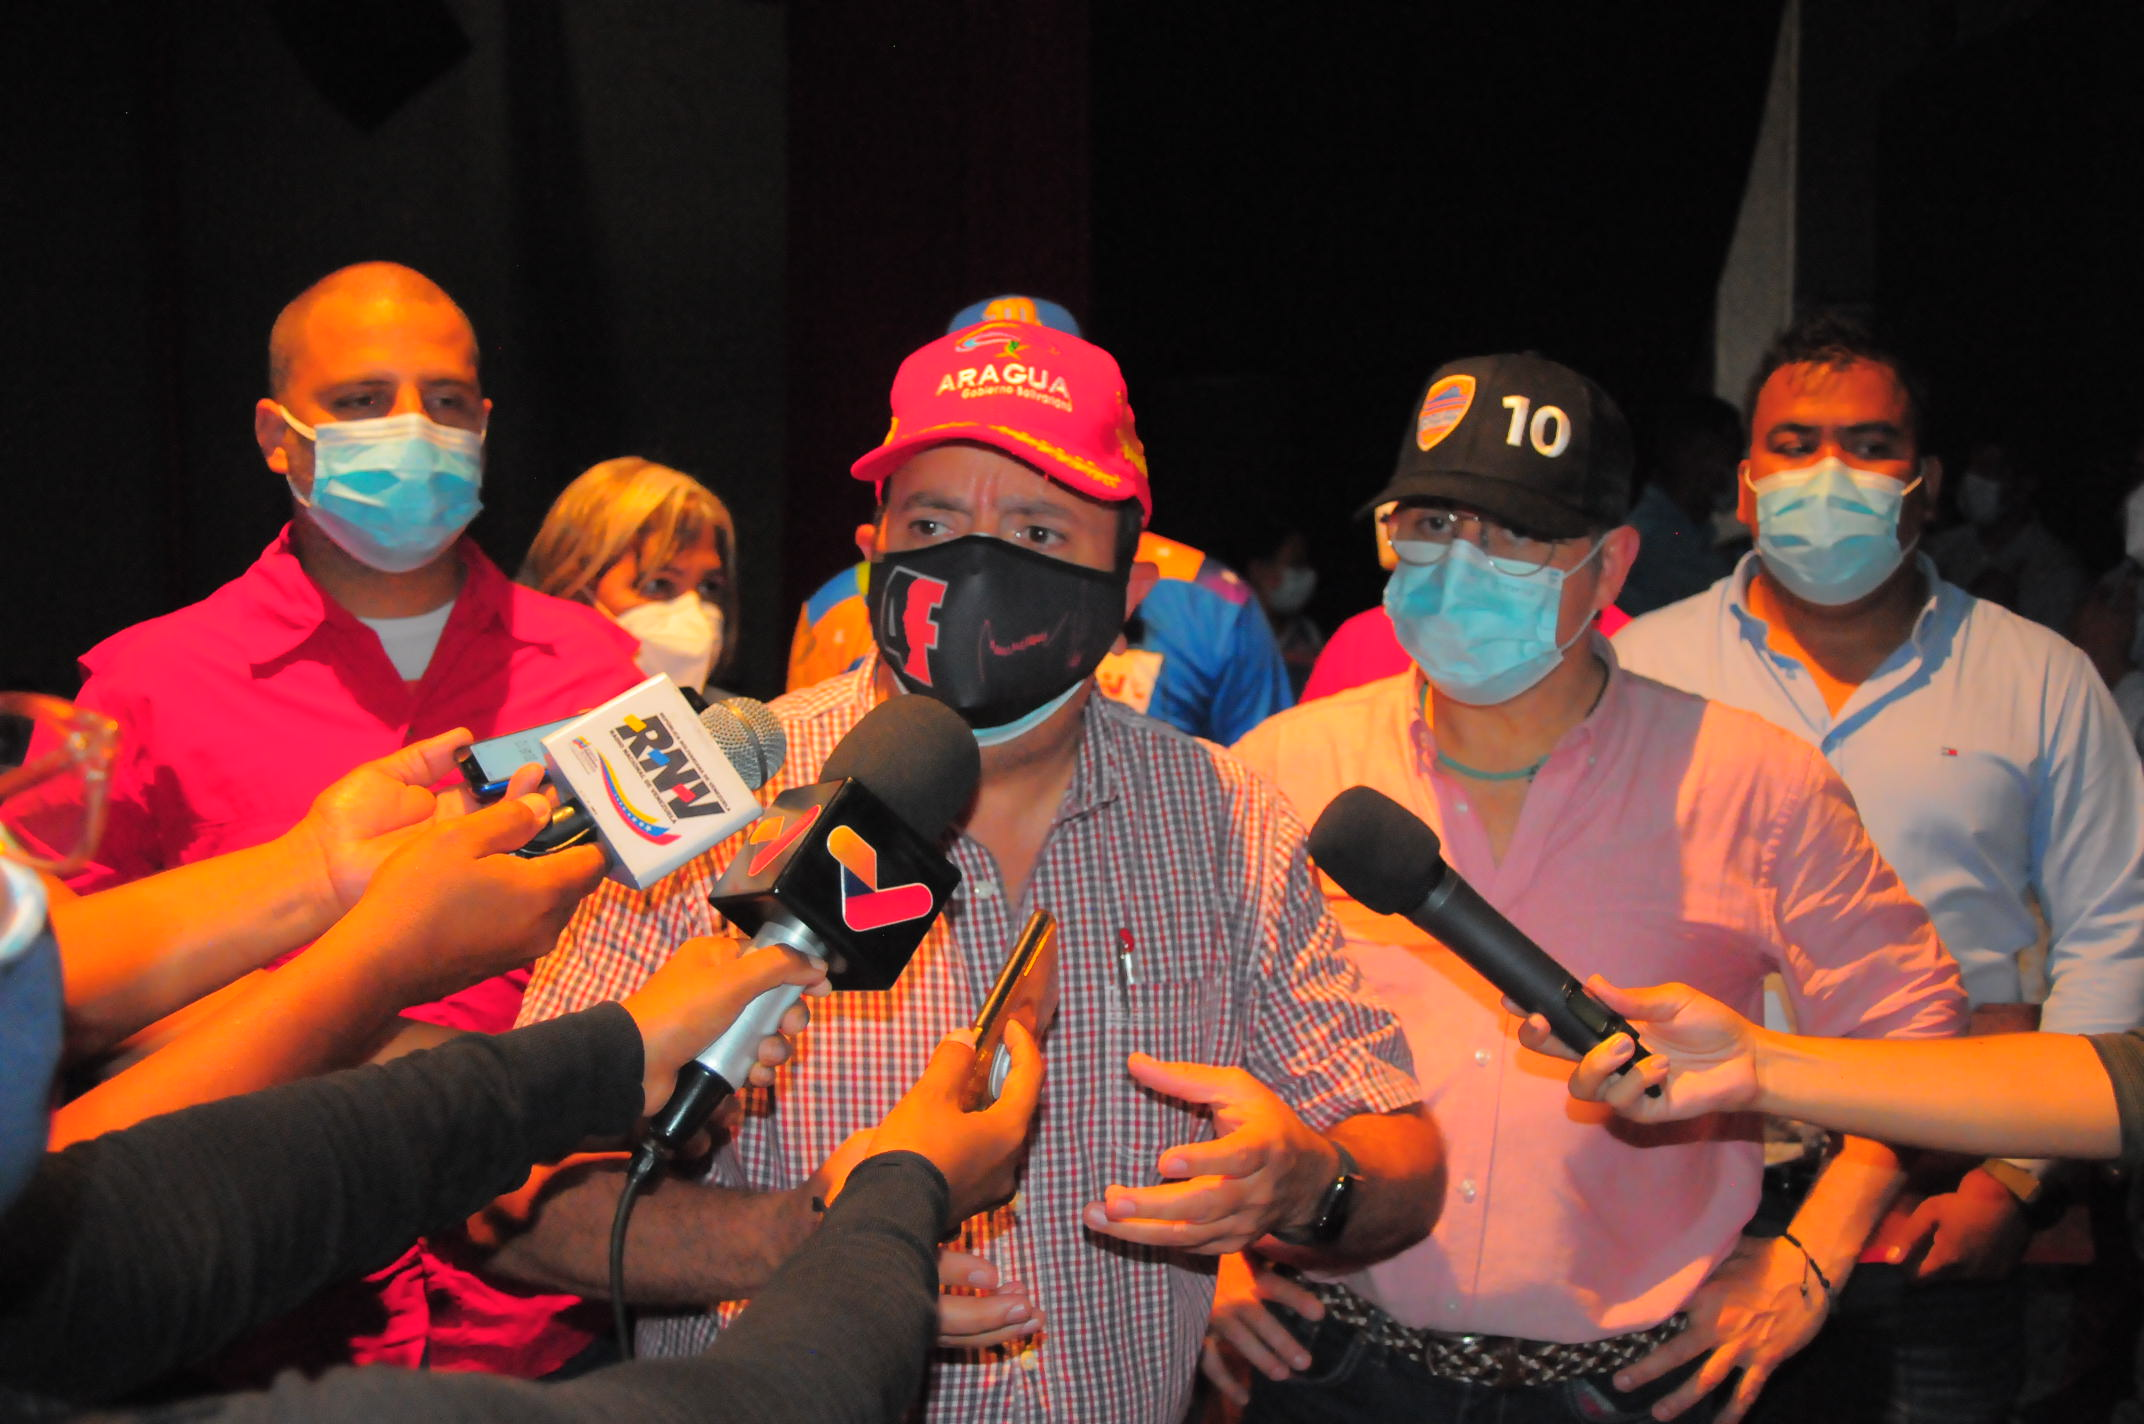 RODOLFO MARCO TORRES Vicepresidente territorial Psuv Aragua y Carabobo